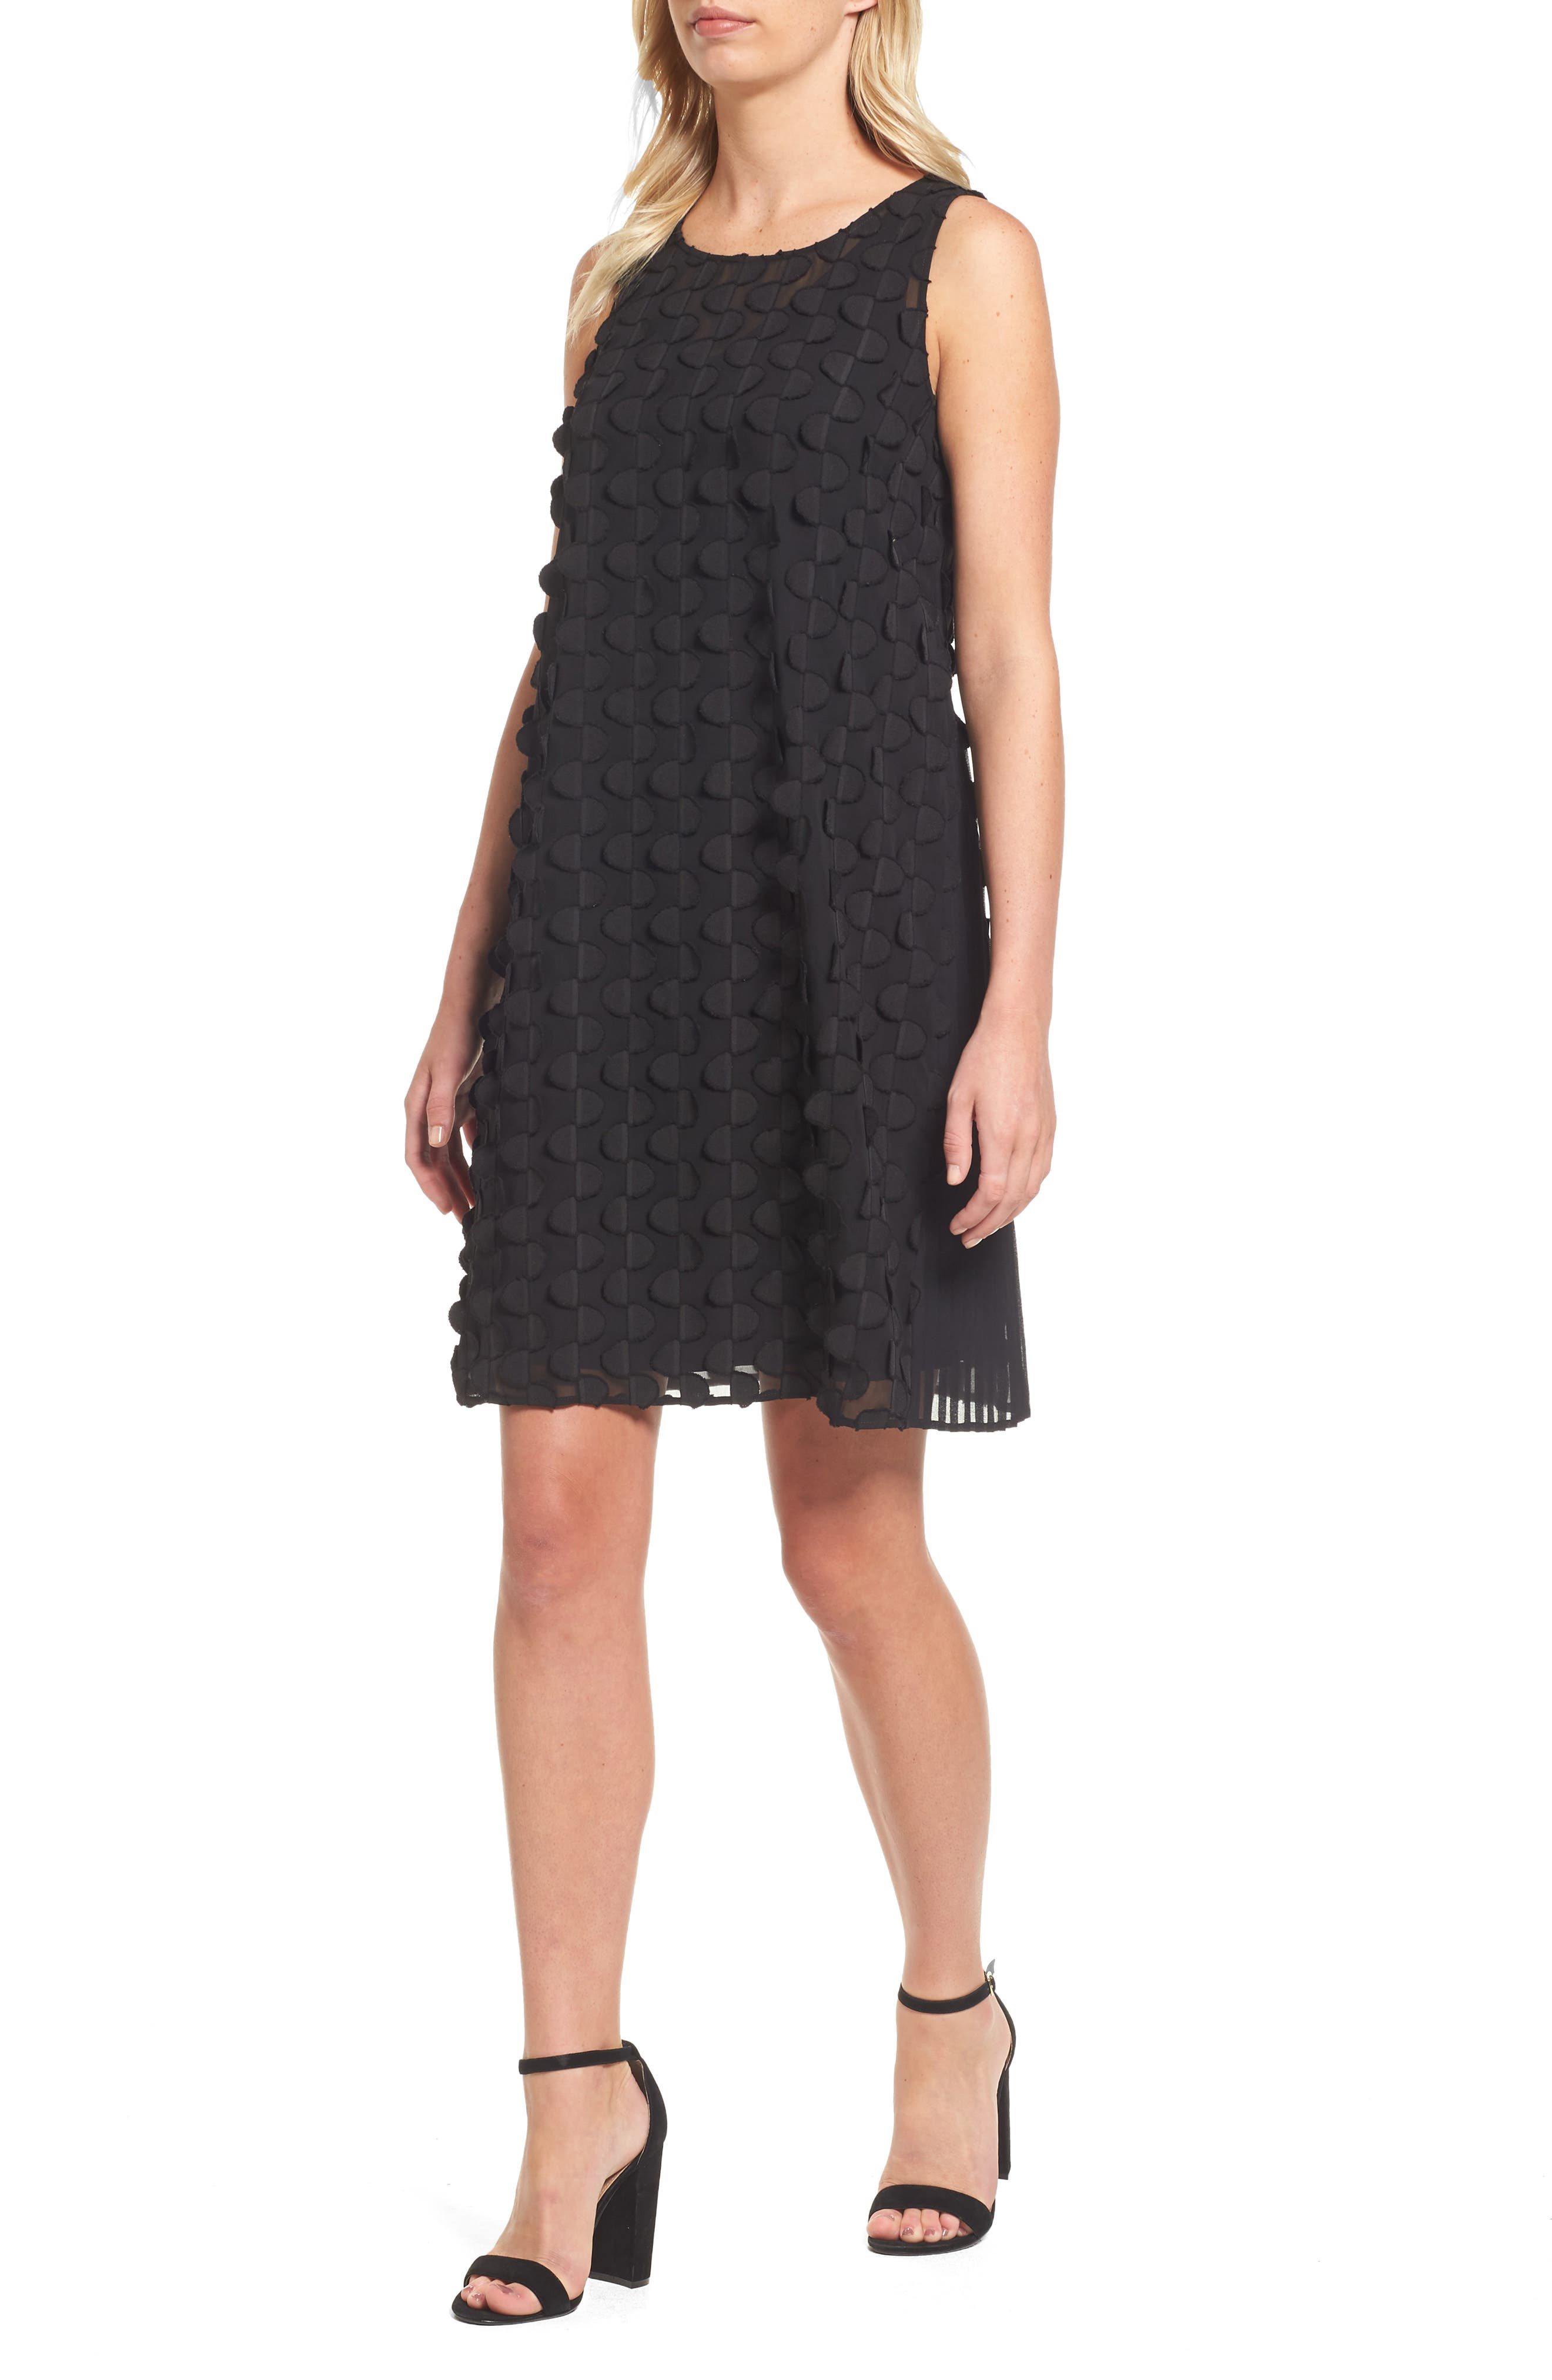 Alternate Image 1 Selected - Nic + Zoe Showtime Shift Dress (Regular & Petite)